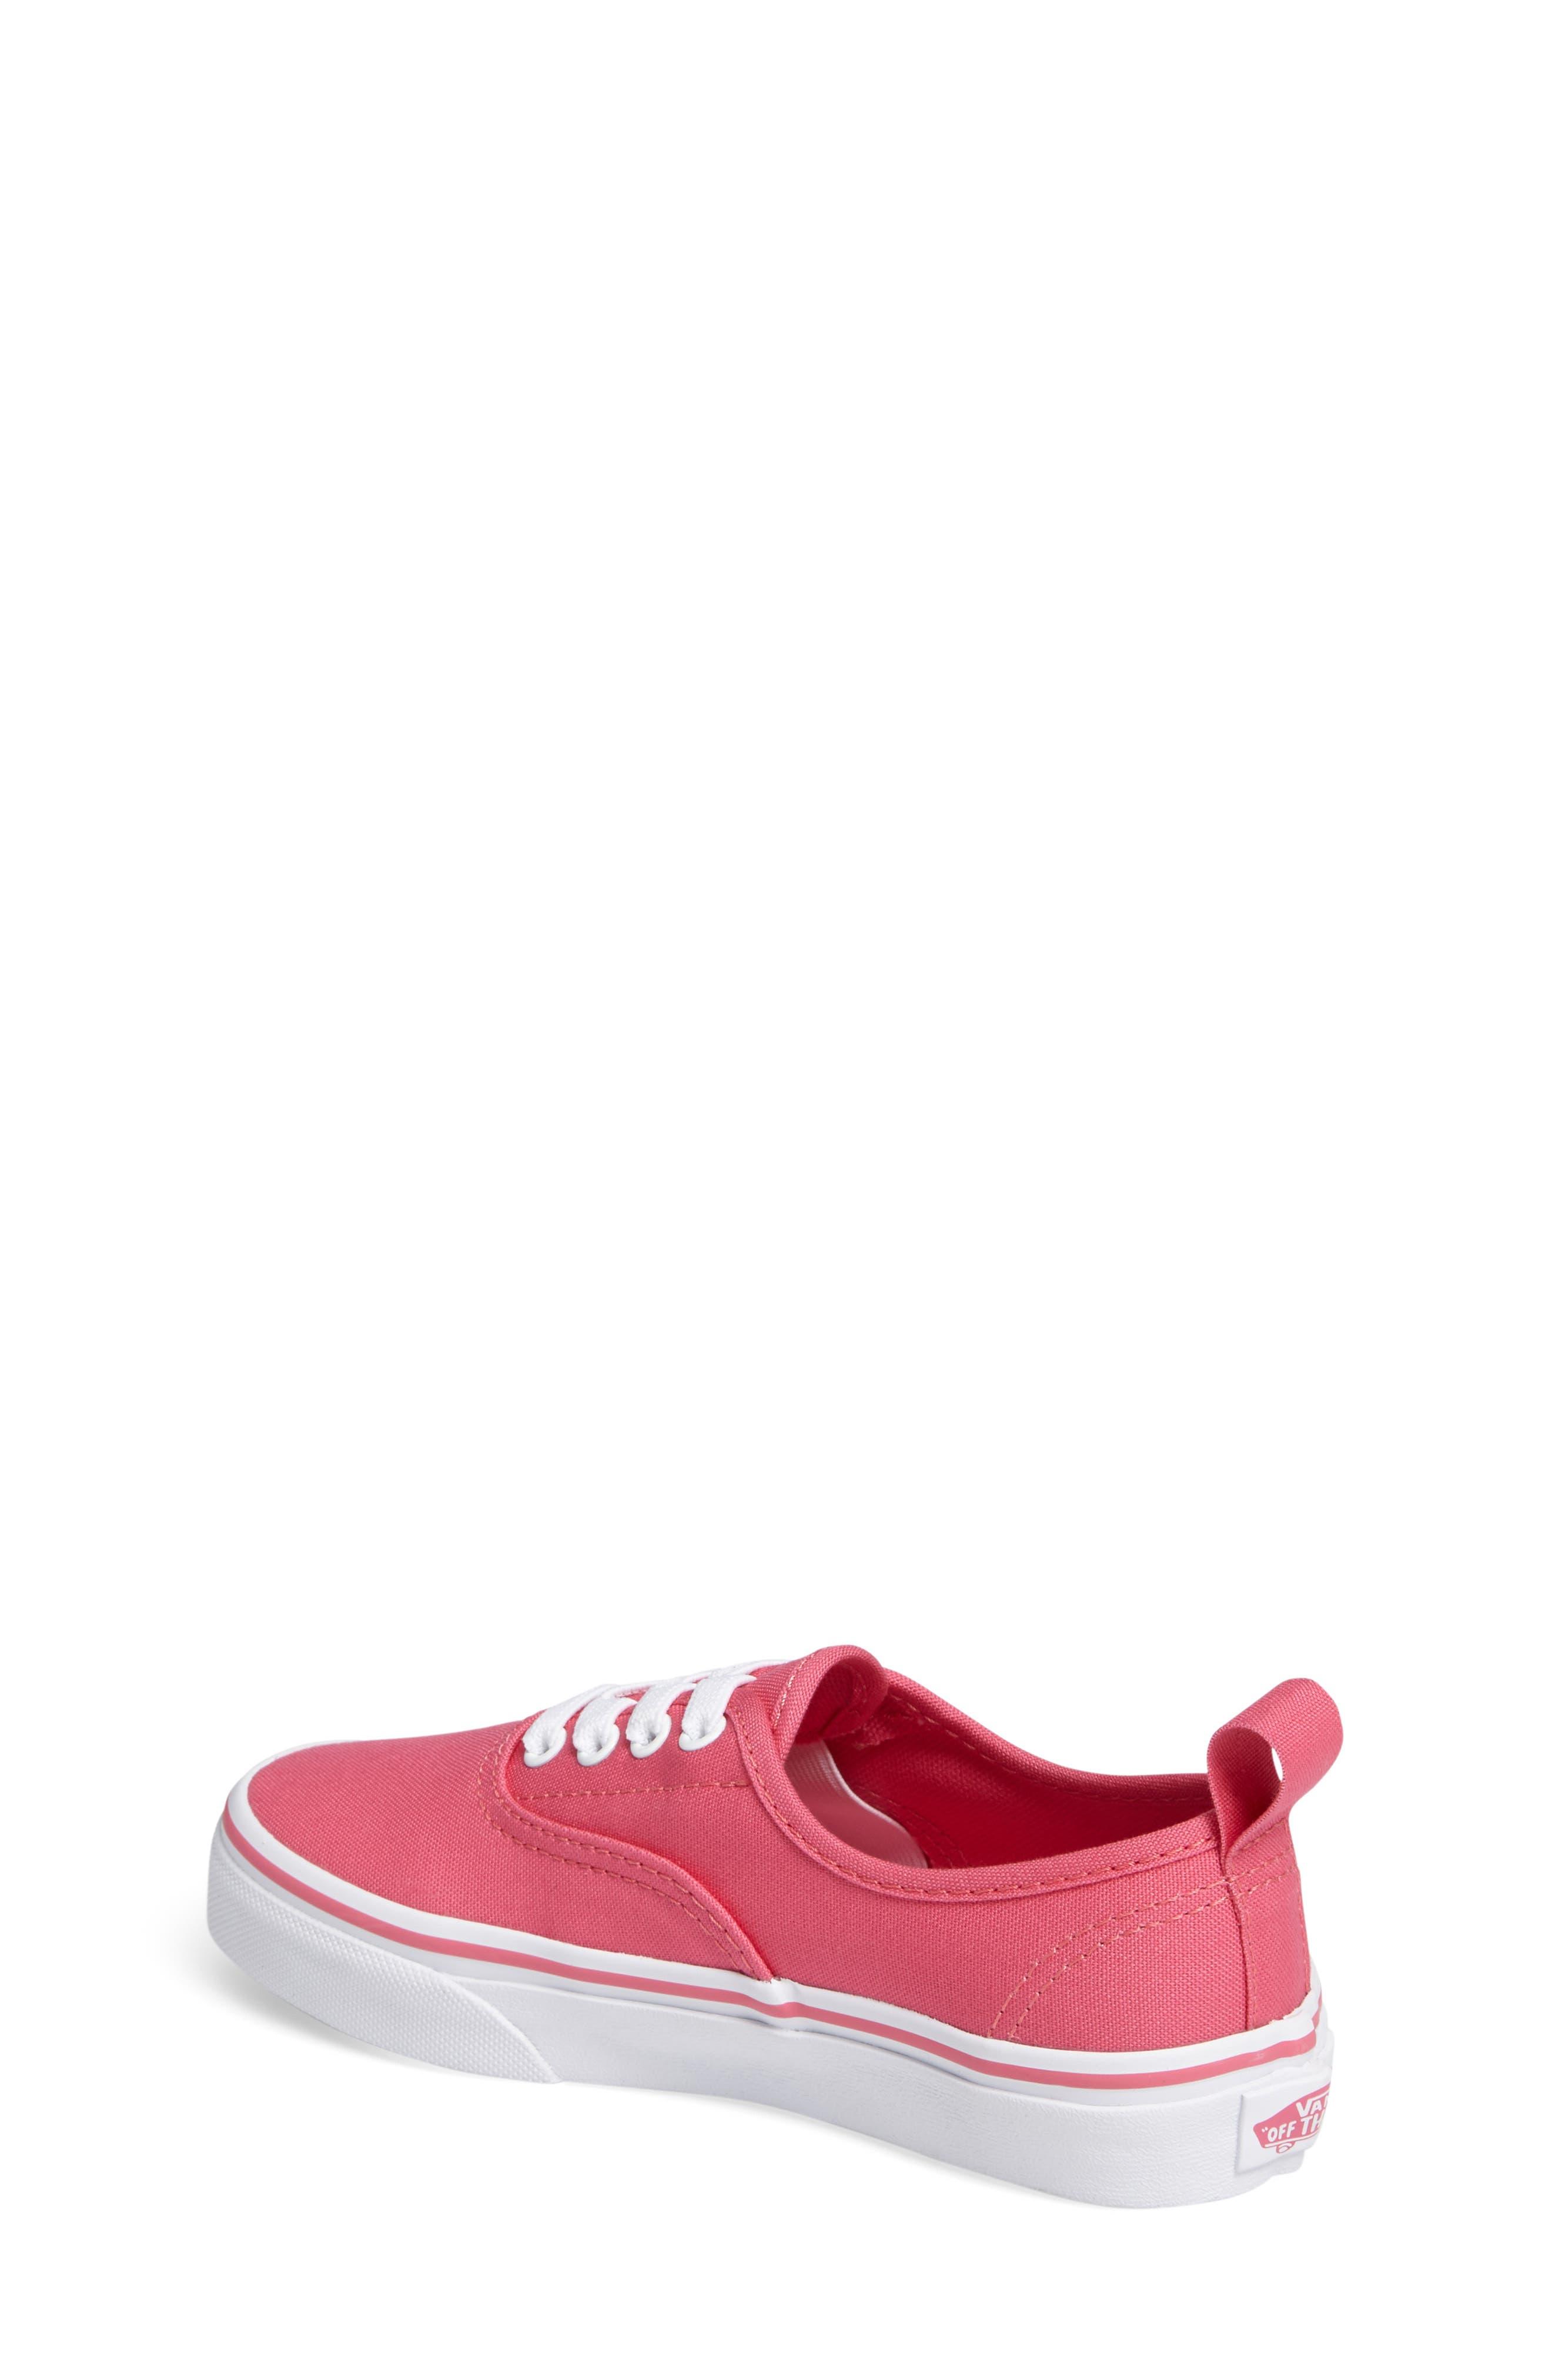 Alternate Image 2  - Vans Authentic Elastic Lace Sneaker (Baby, Walker, Toddler, Little Kid & Big Kid)